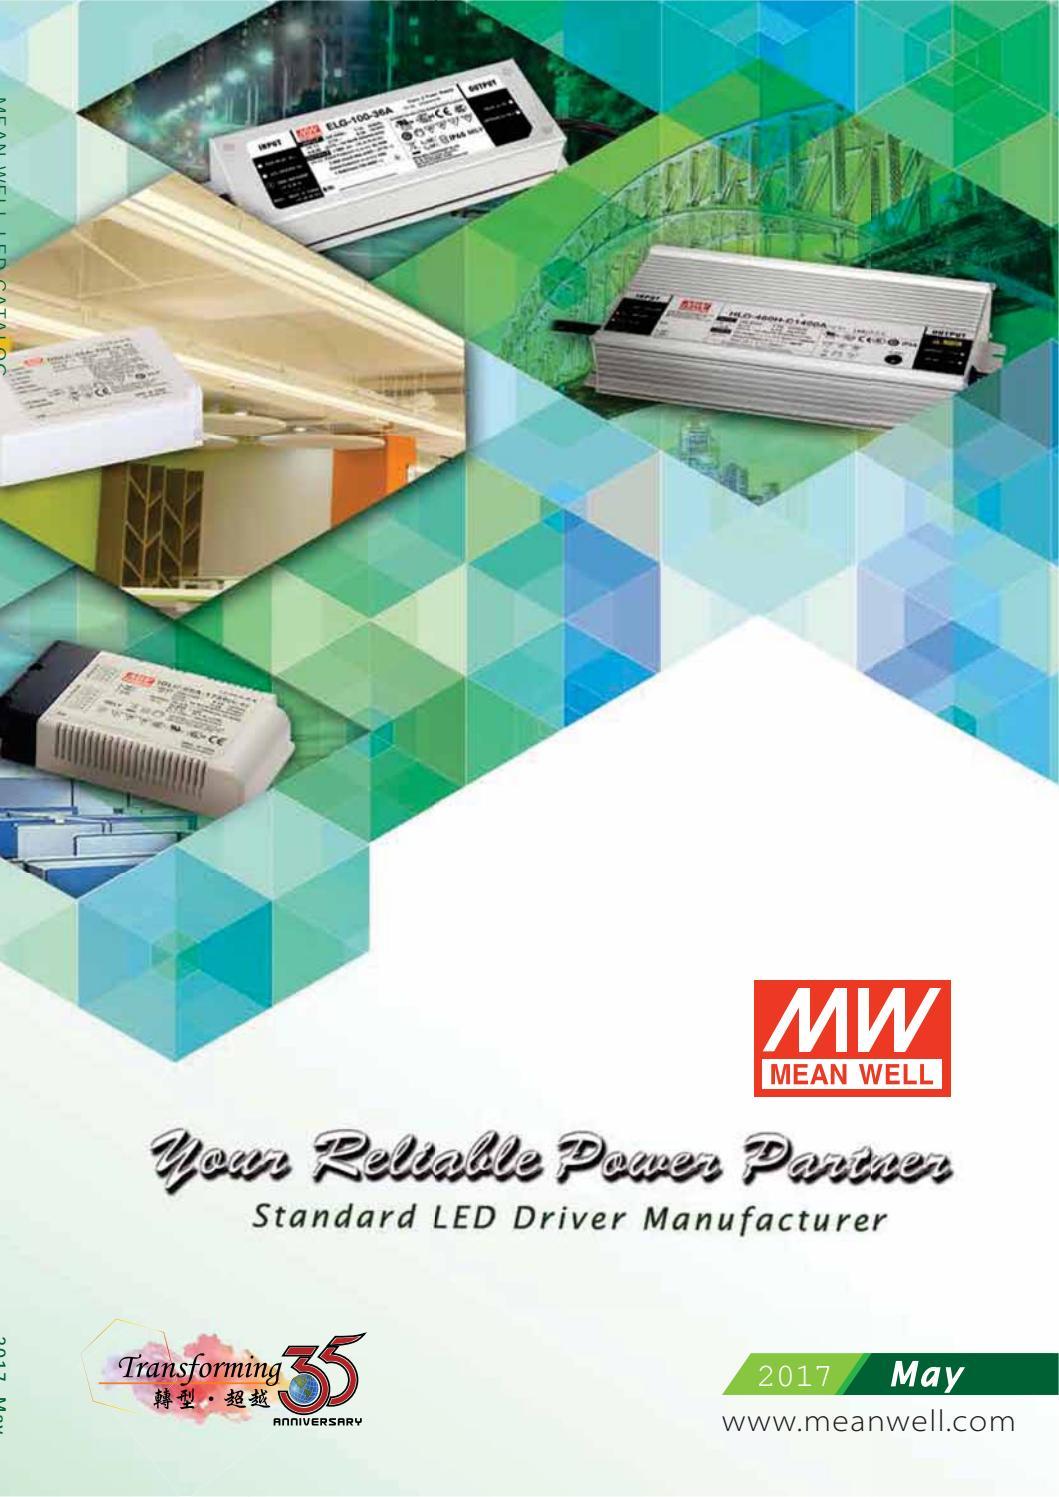 25 Watt 25W Mean Well APC-25-500 C.C IP42 LED Driver // Power Supply 500mA